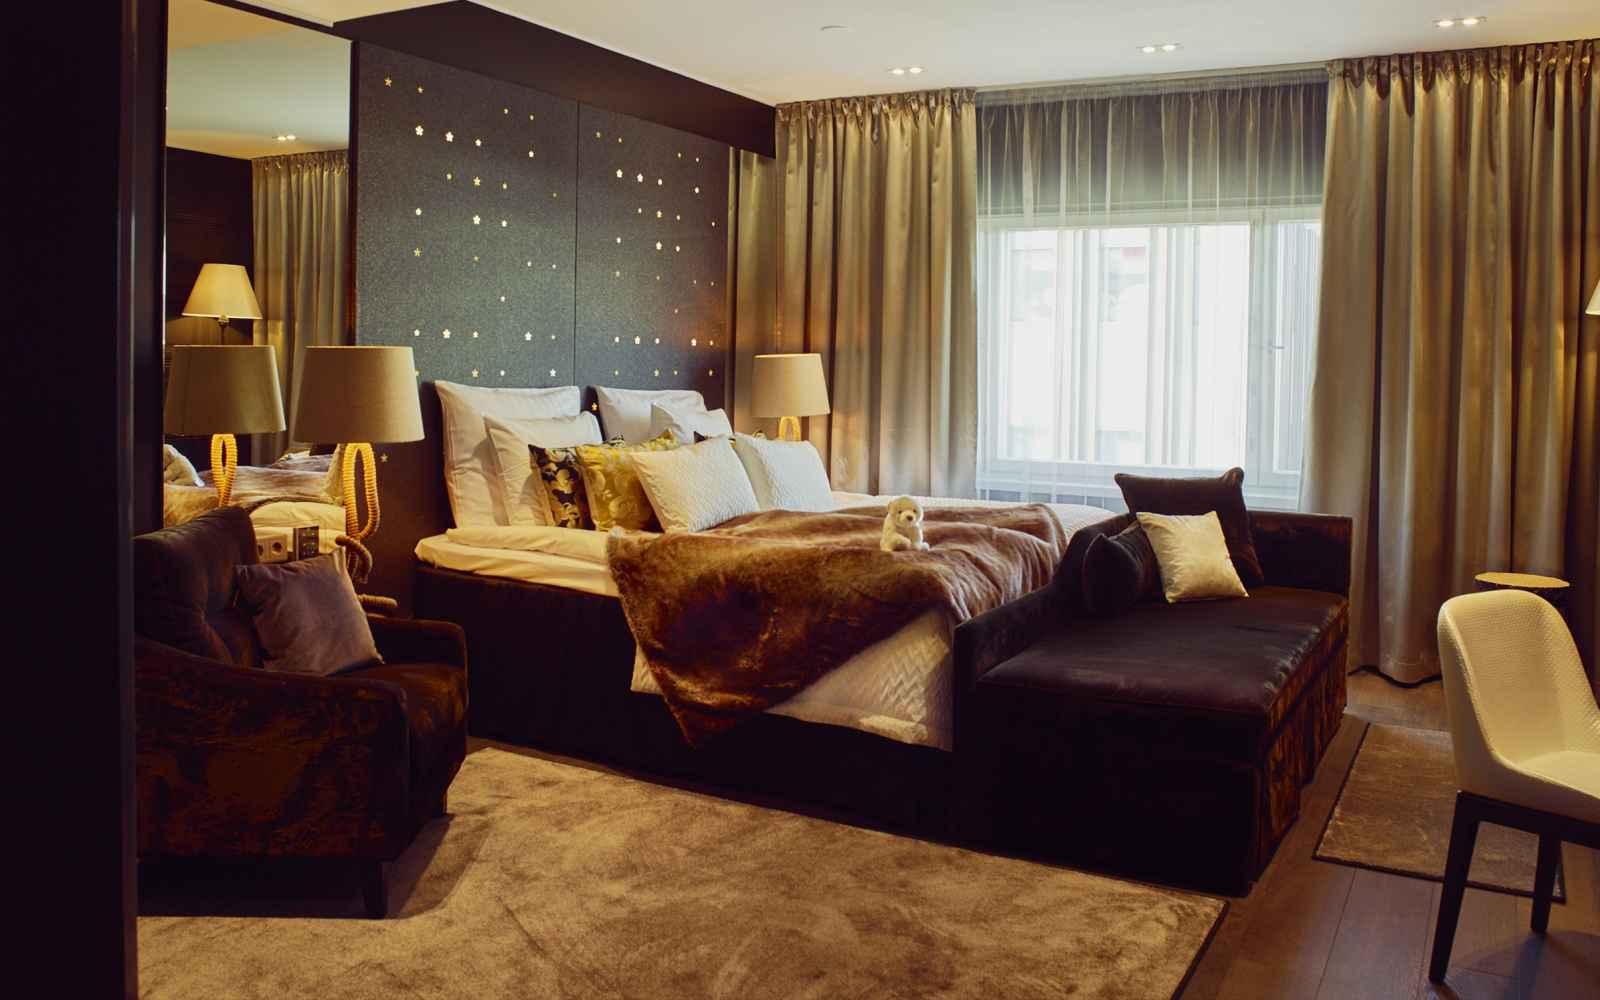 Arctic Light Hotel 5 jours / 4 nuits